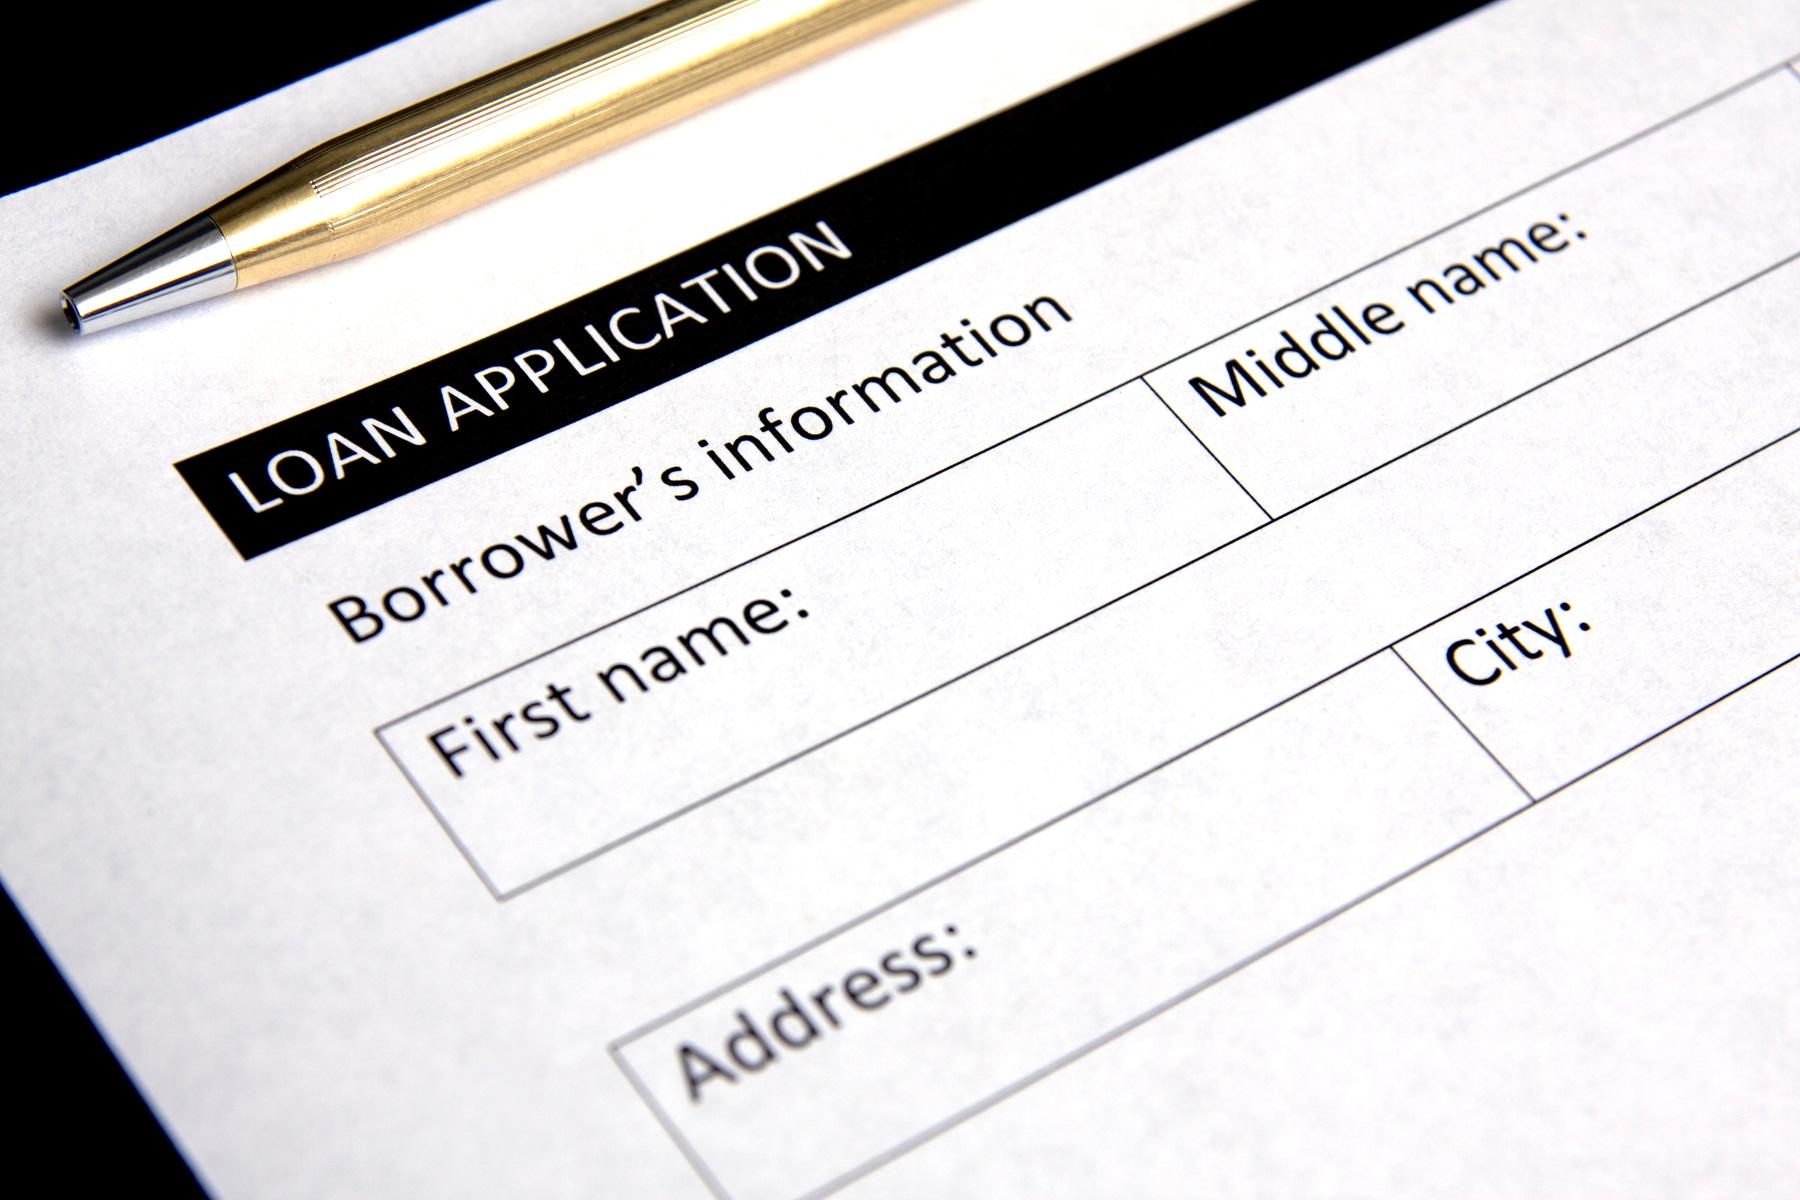 covid-19 recovery loan scheme application sheet